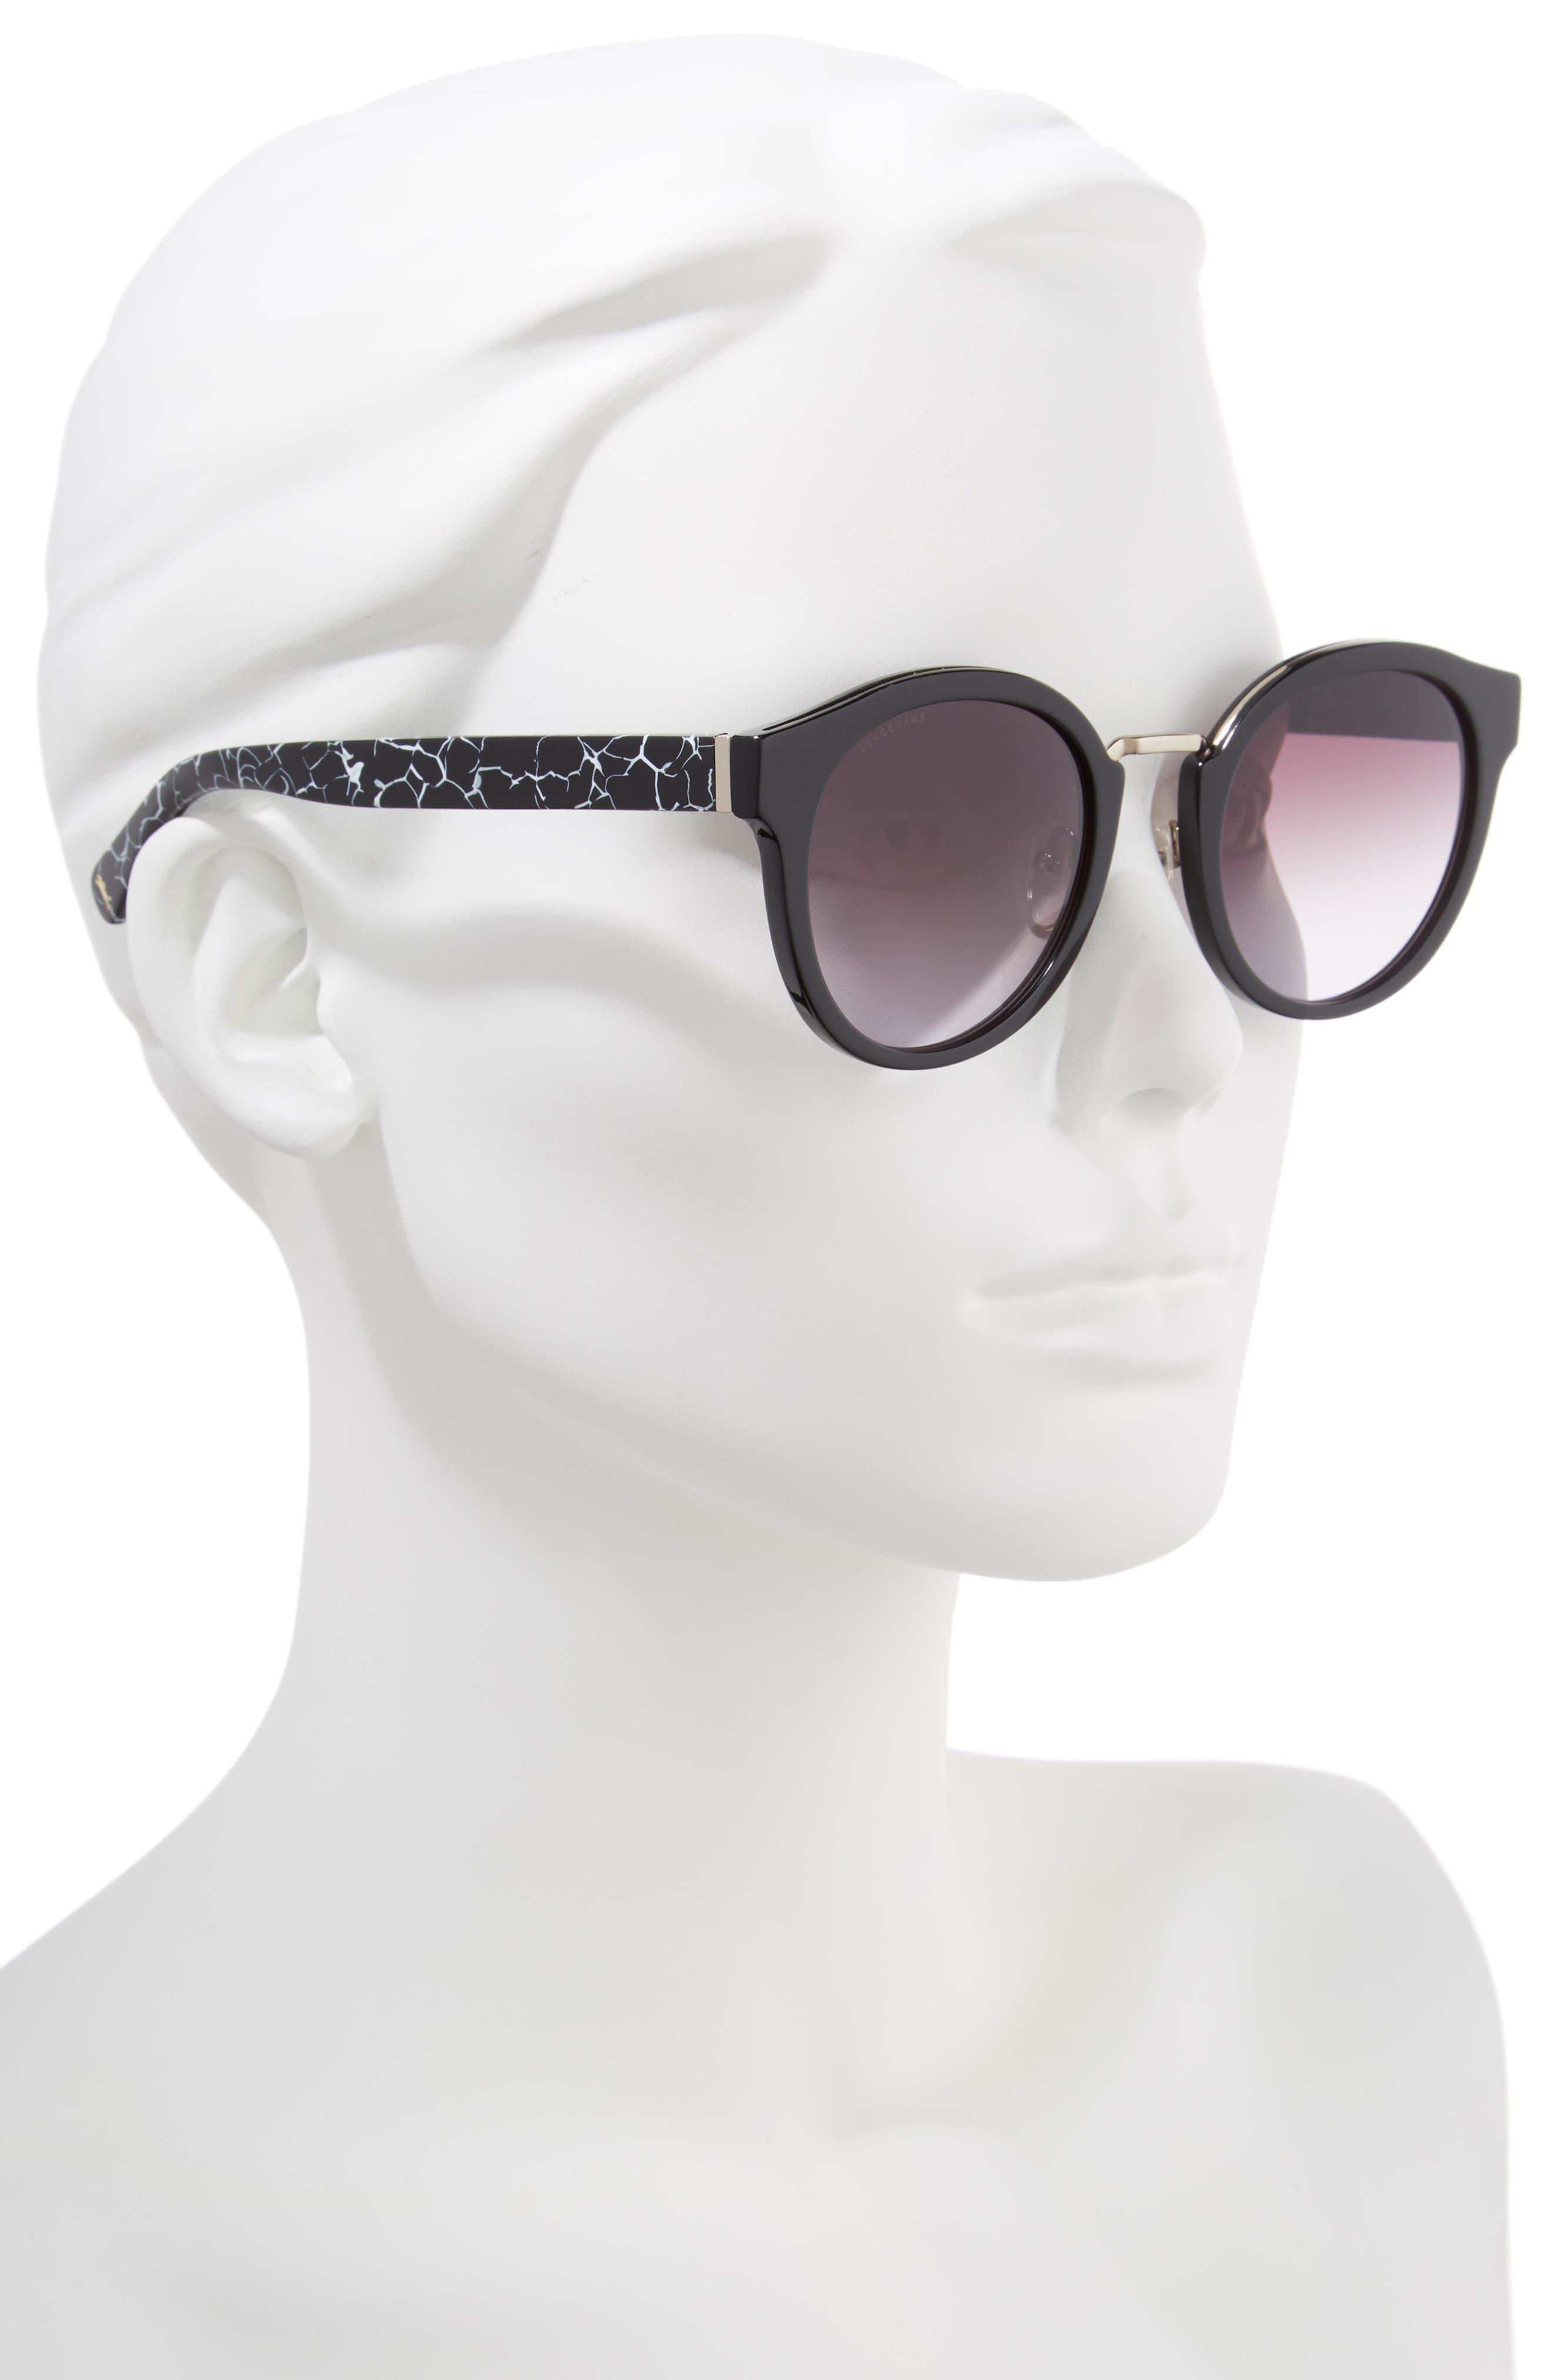 51mm Round Sunglasses,                             Alternate thumbnail 2, color,                             MARBLE BLACK